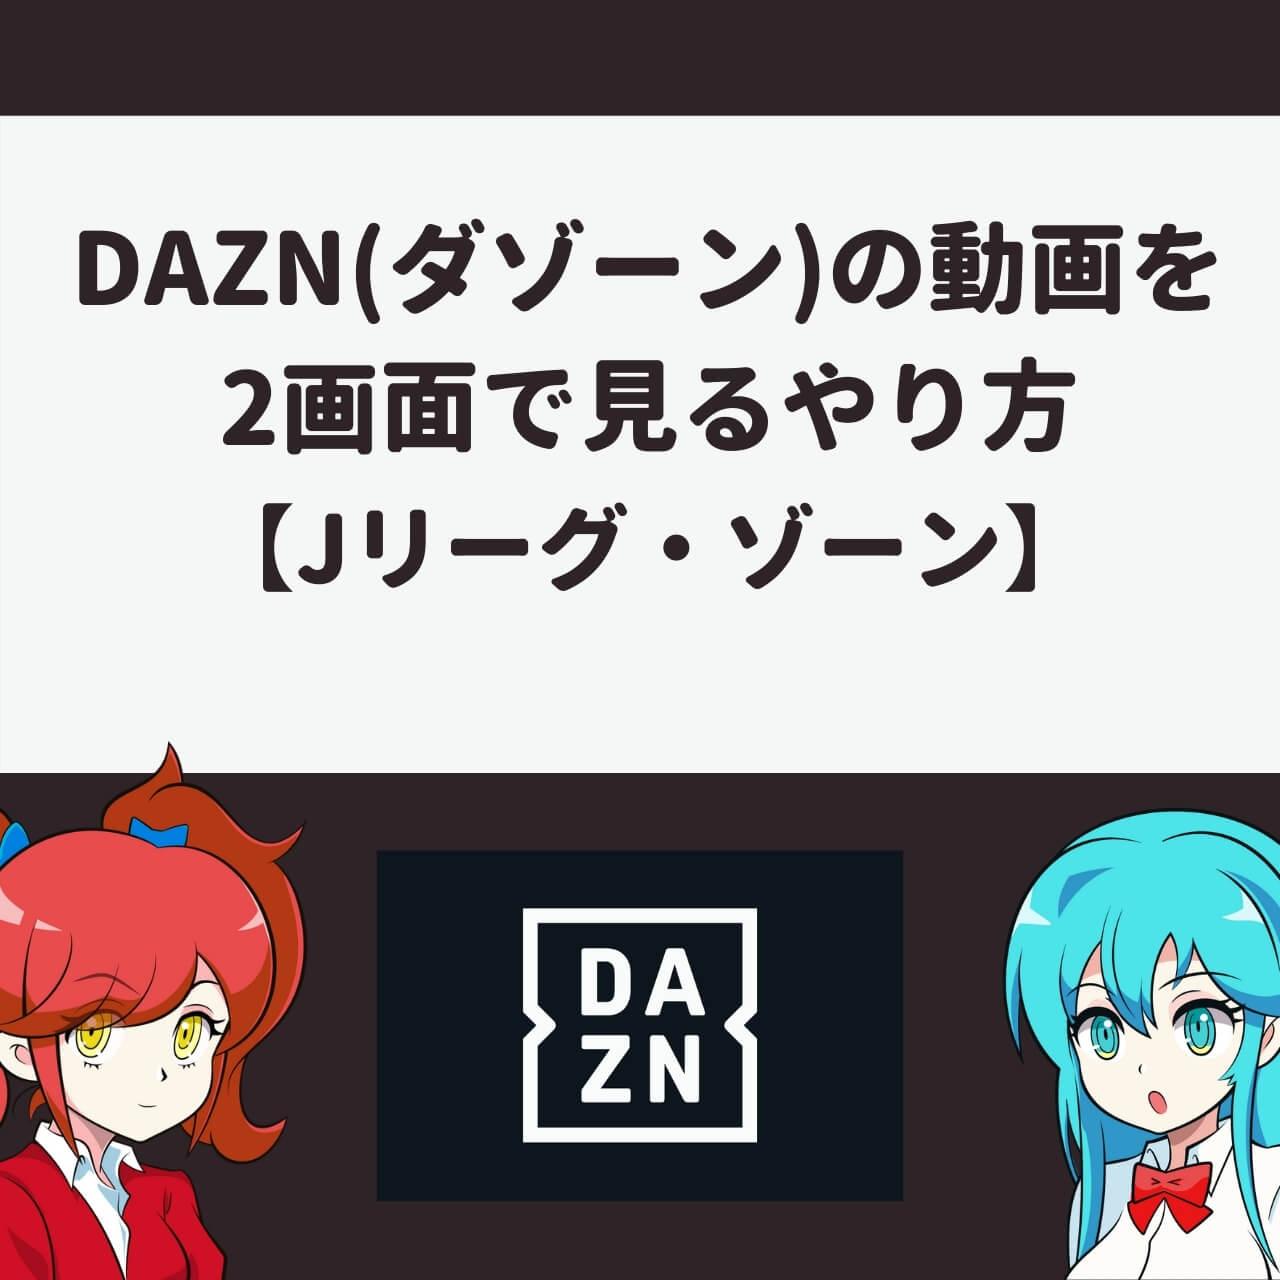 DAZN(ダゾーン)の動画を2画面で見るやり方【Jリーグ・ゾーン】